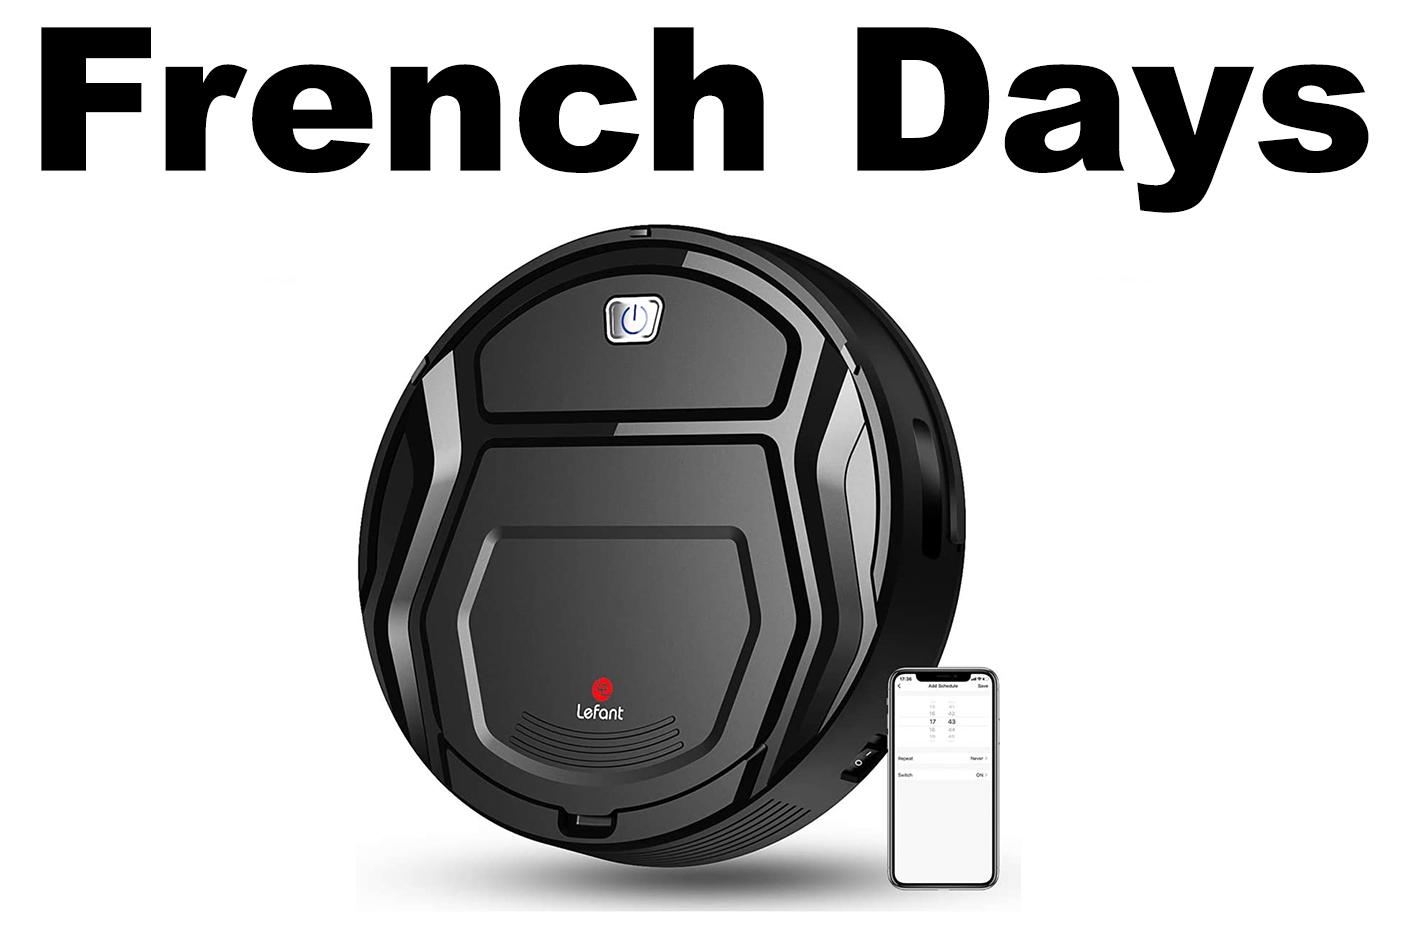 French Days Aspirateur Robot